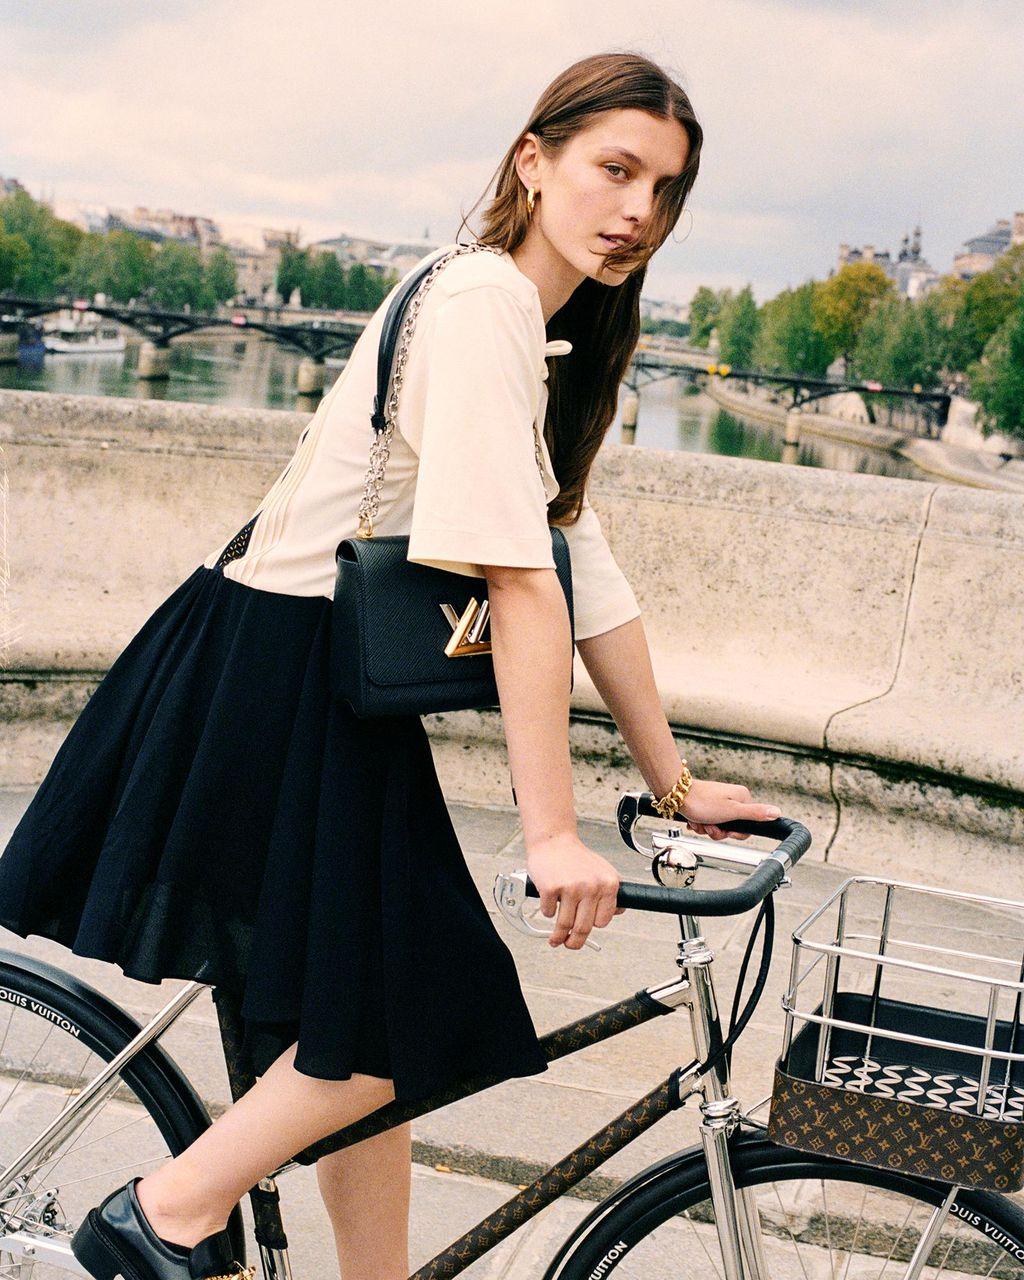 Sepeda Louis Vuitton Maison TAMBOITE